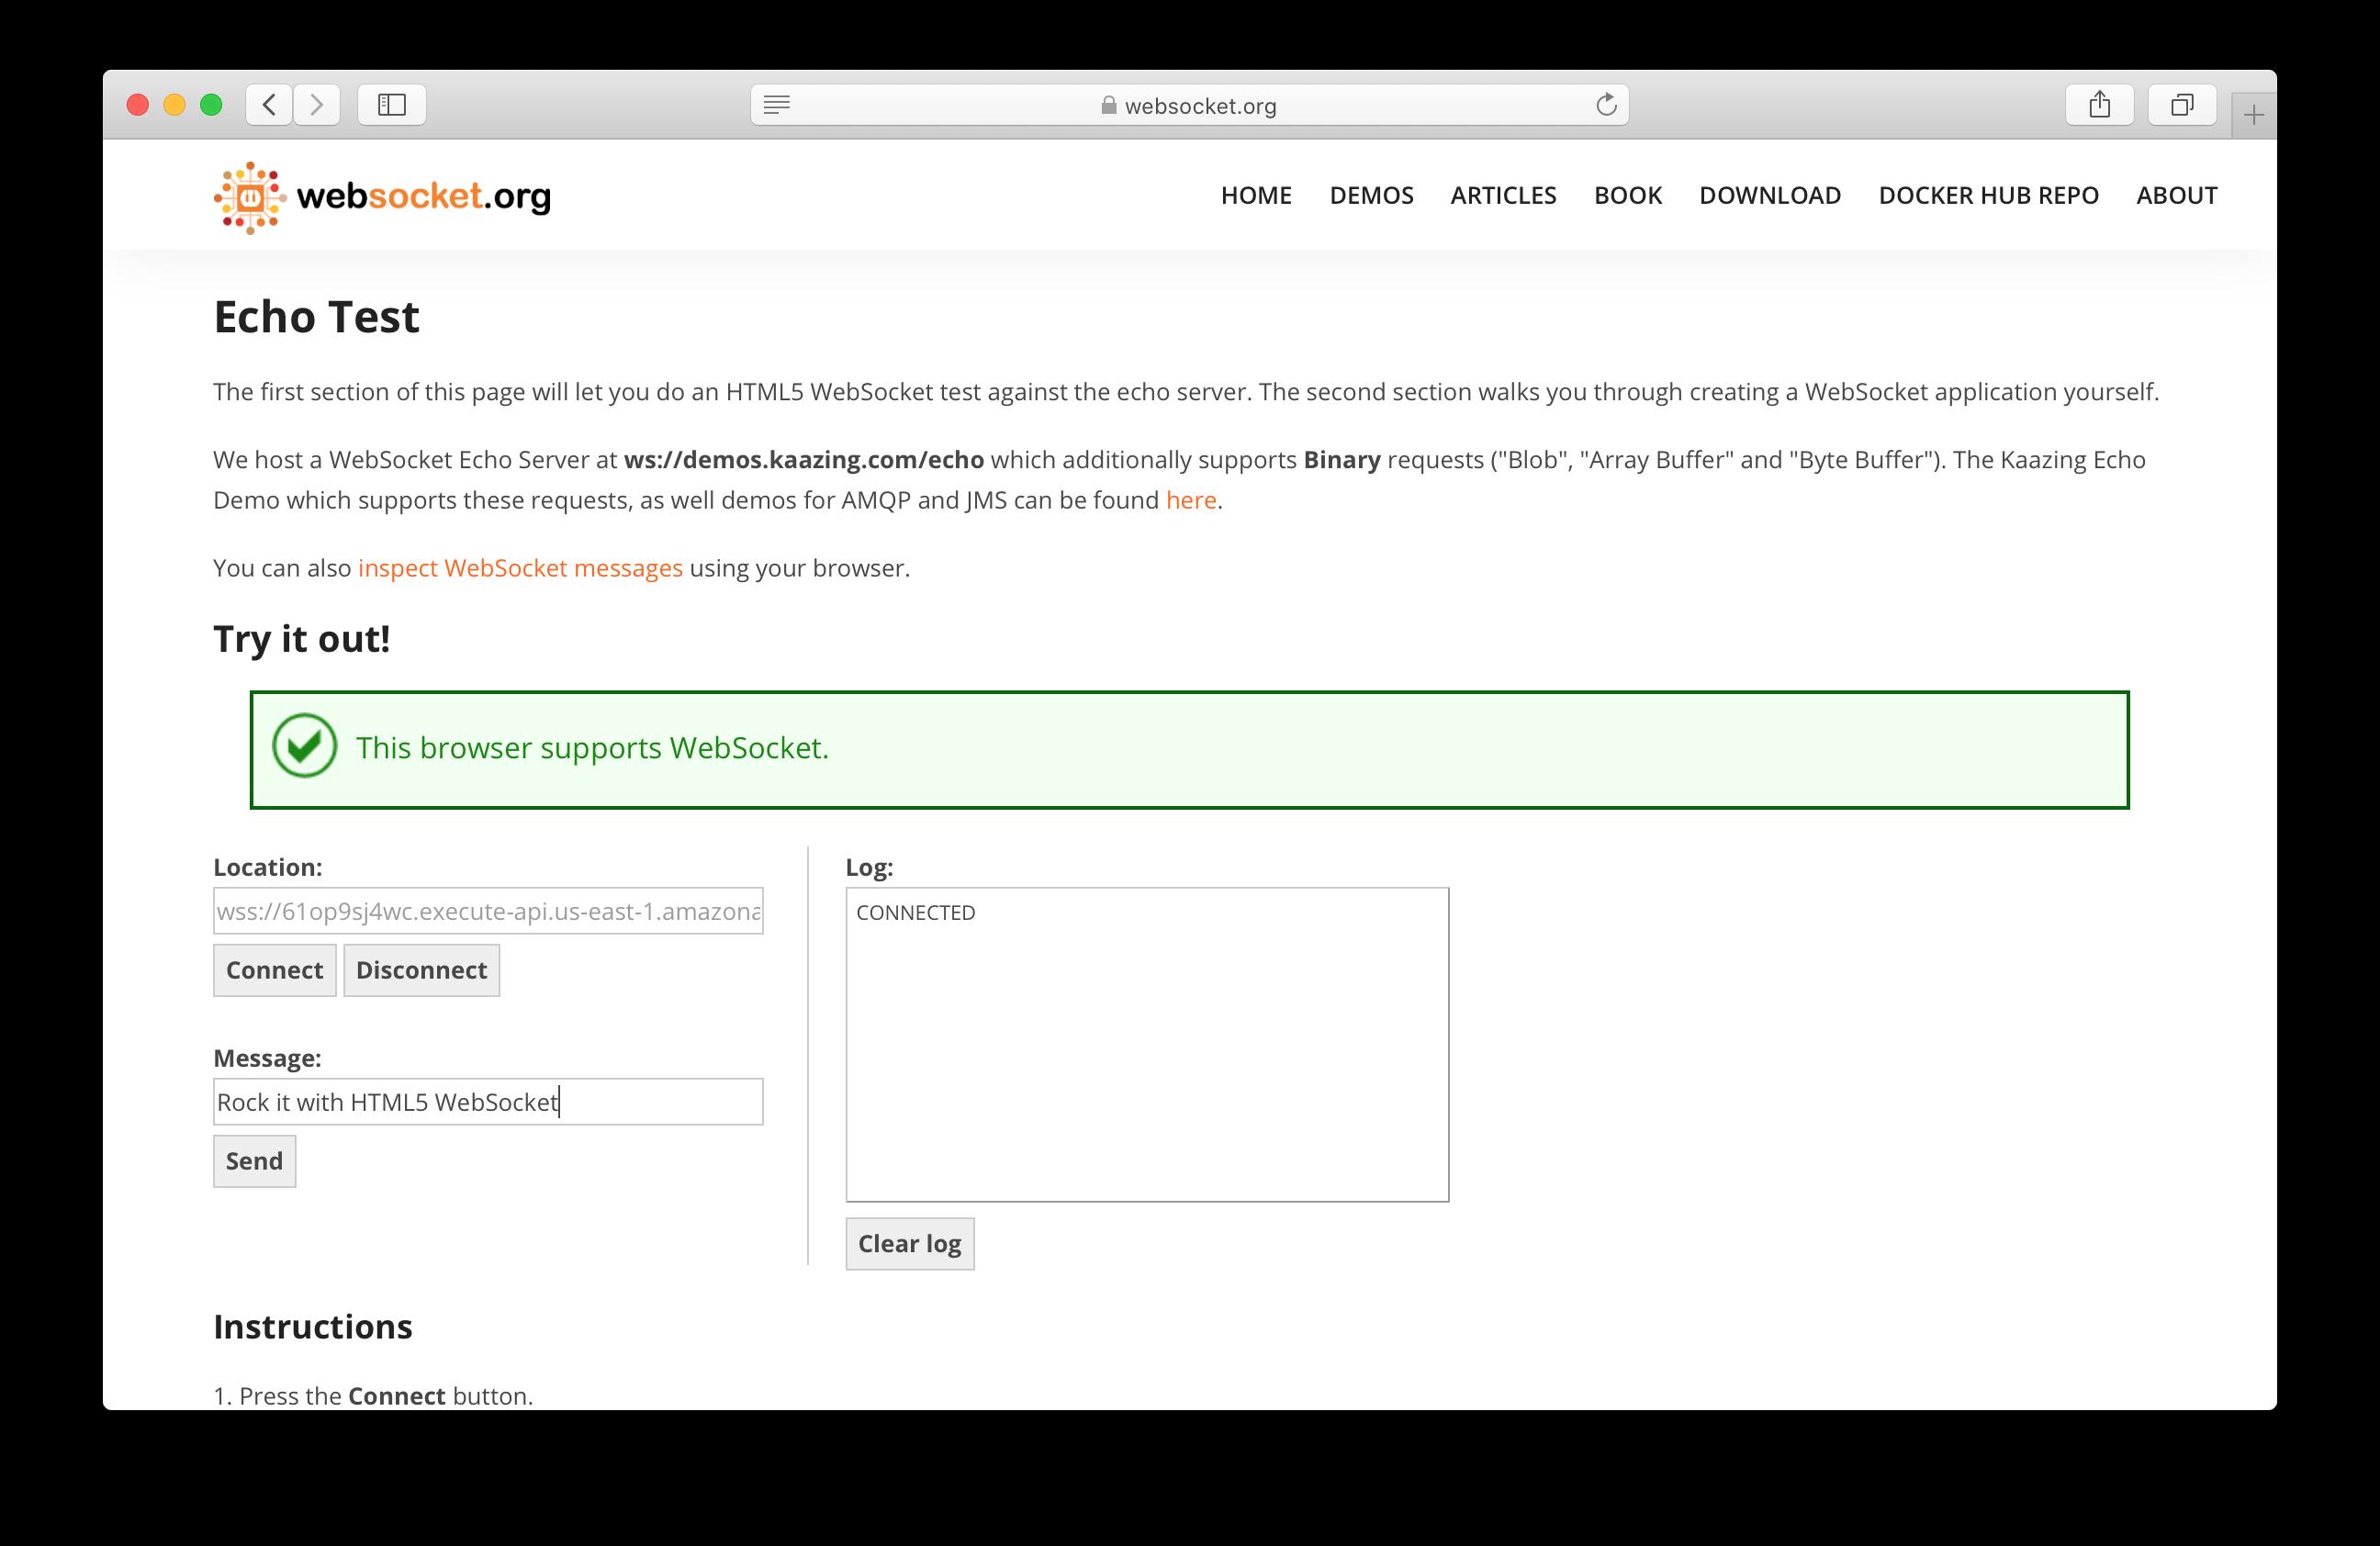 Connect to serverless WebSocket API again